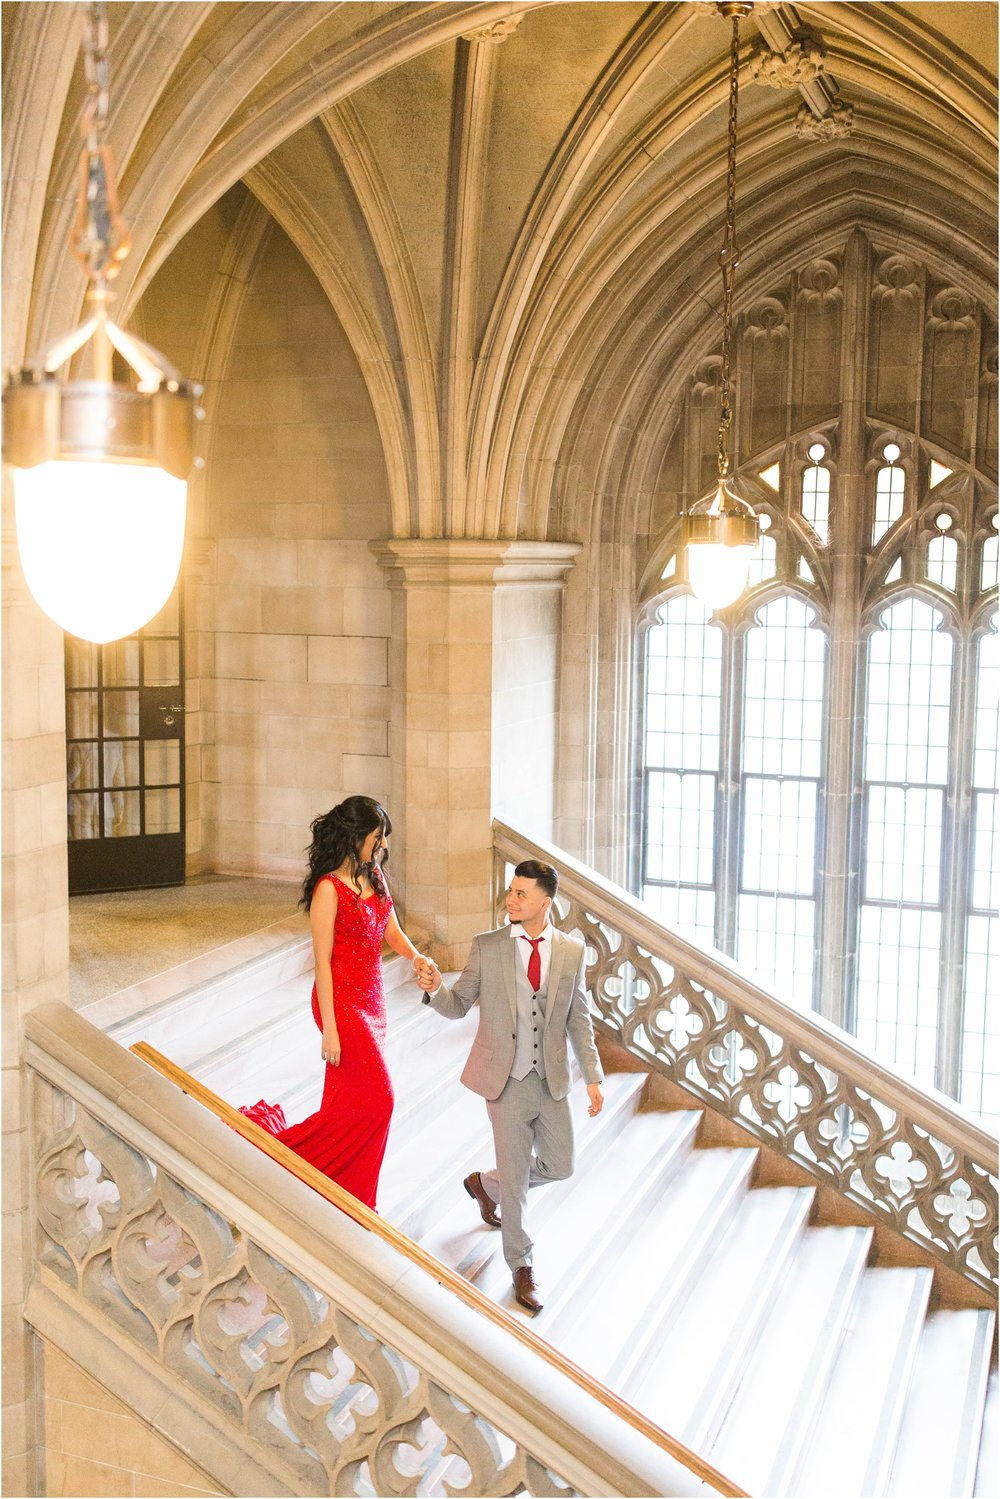 Knox-College-U-of-T-University-of-Toronto-Distillery-District-Engagement-Session-Toronto-Mississauga-Brampton-Scarborough-GTA-Pakistani-Indian-Wedding-Engagement-Photographer-Photography_0022.jpg